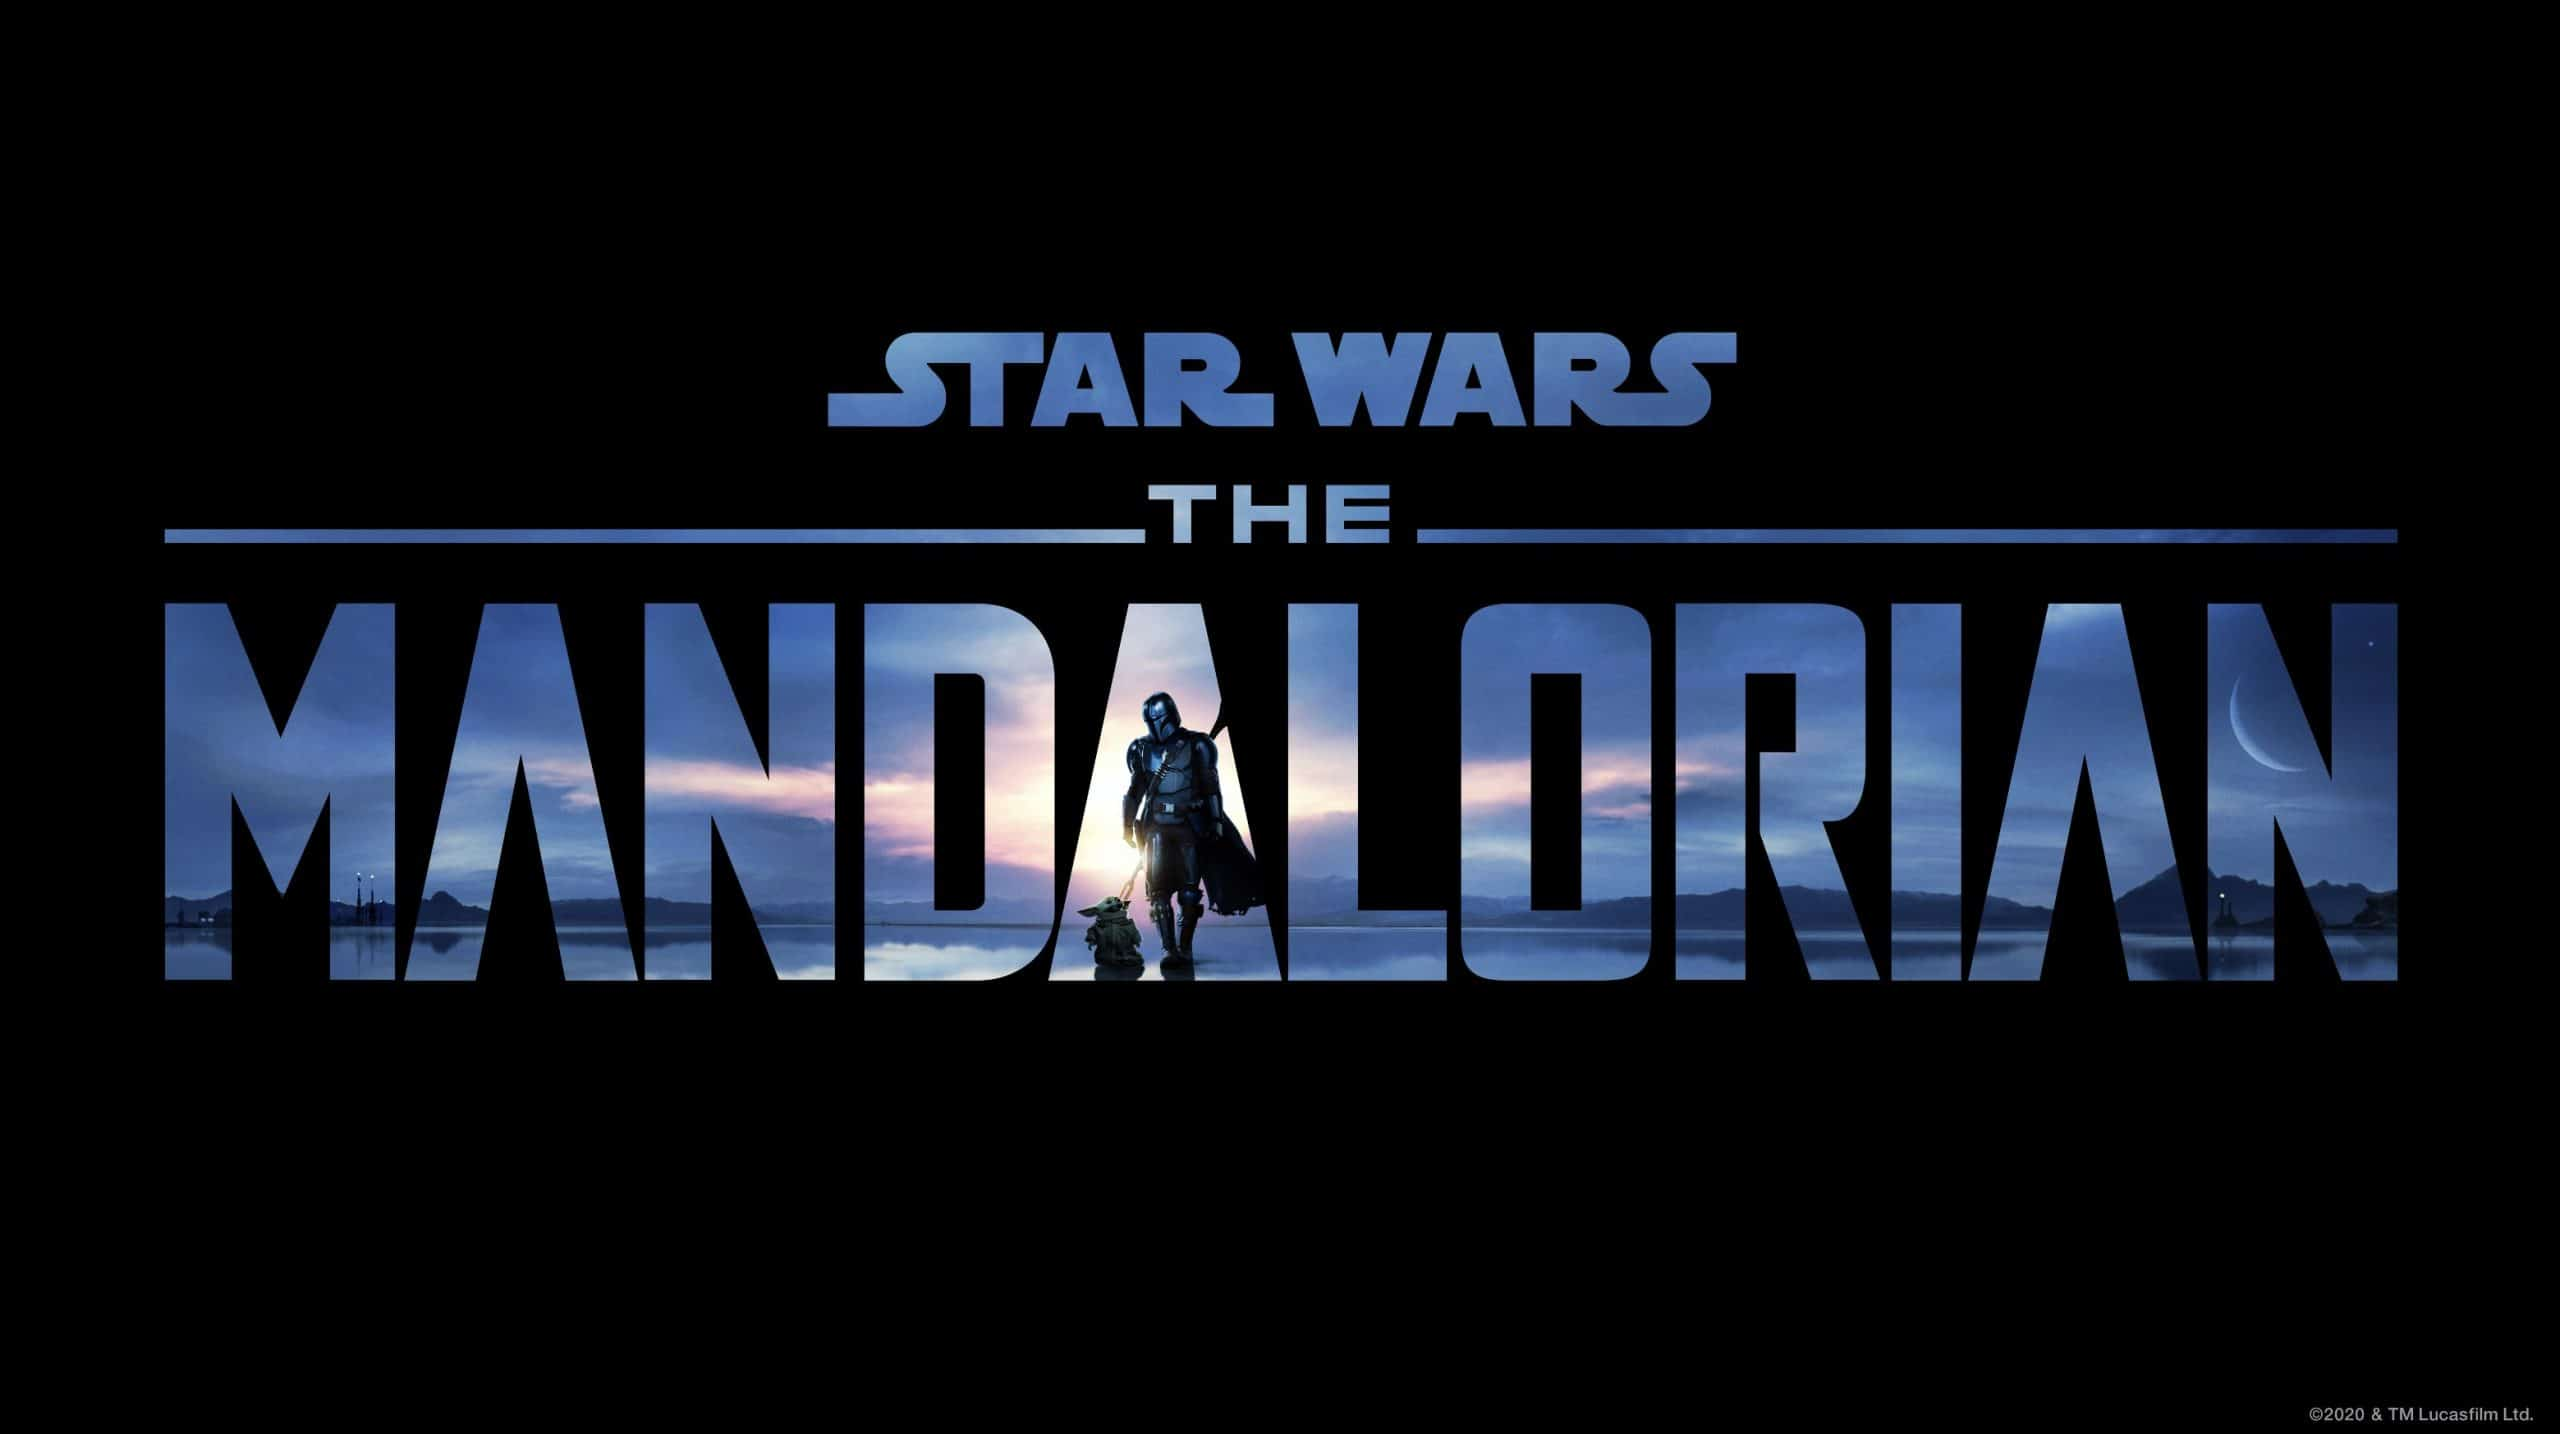 The Mandalorian Character Posters